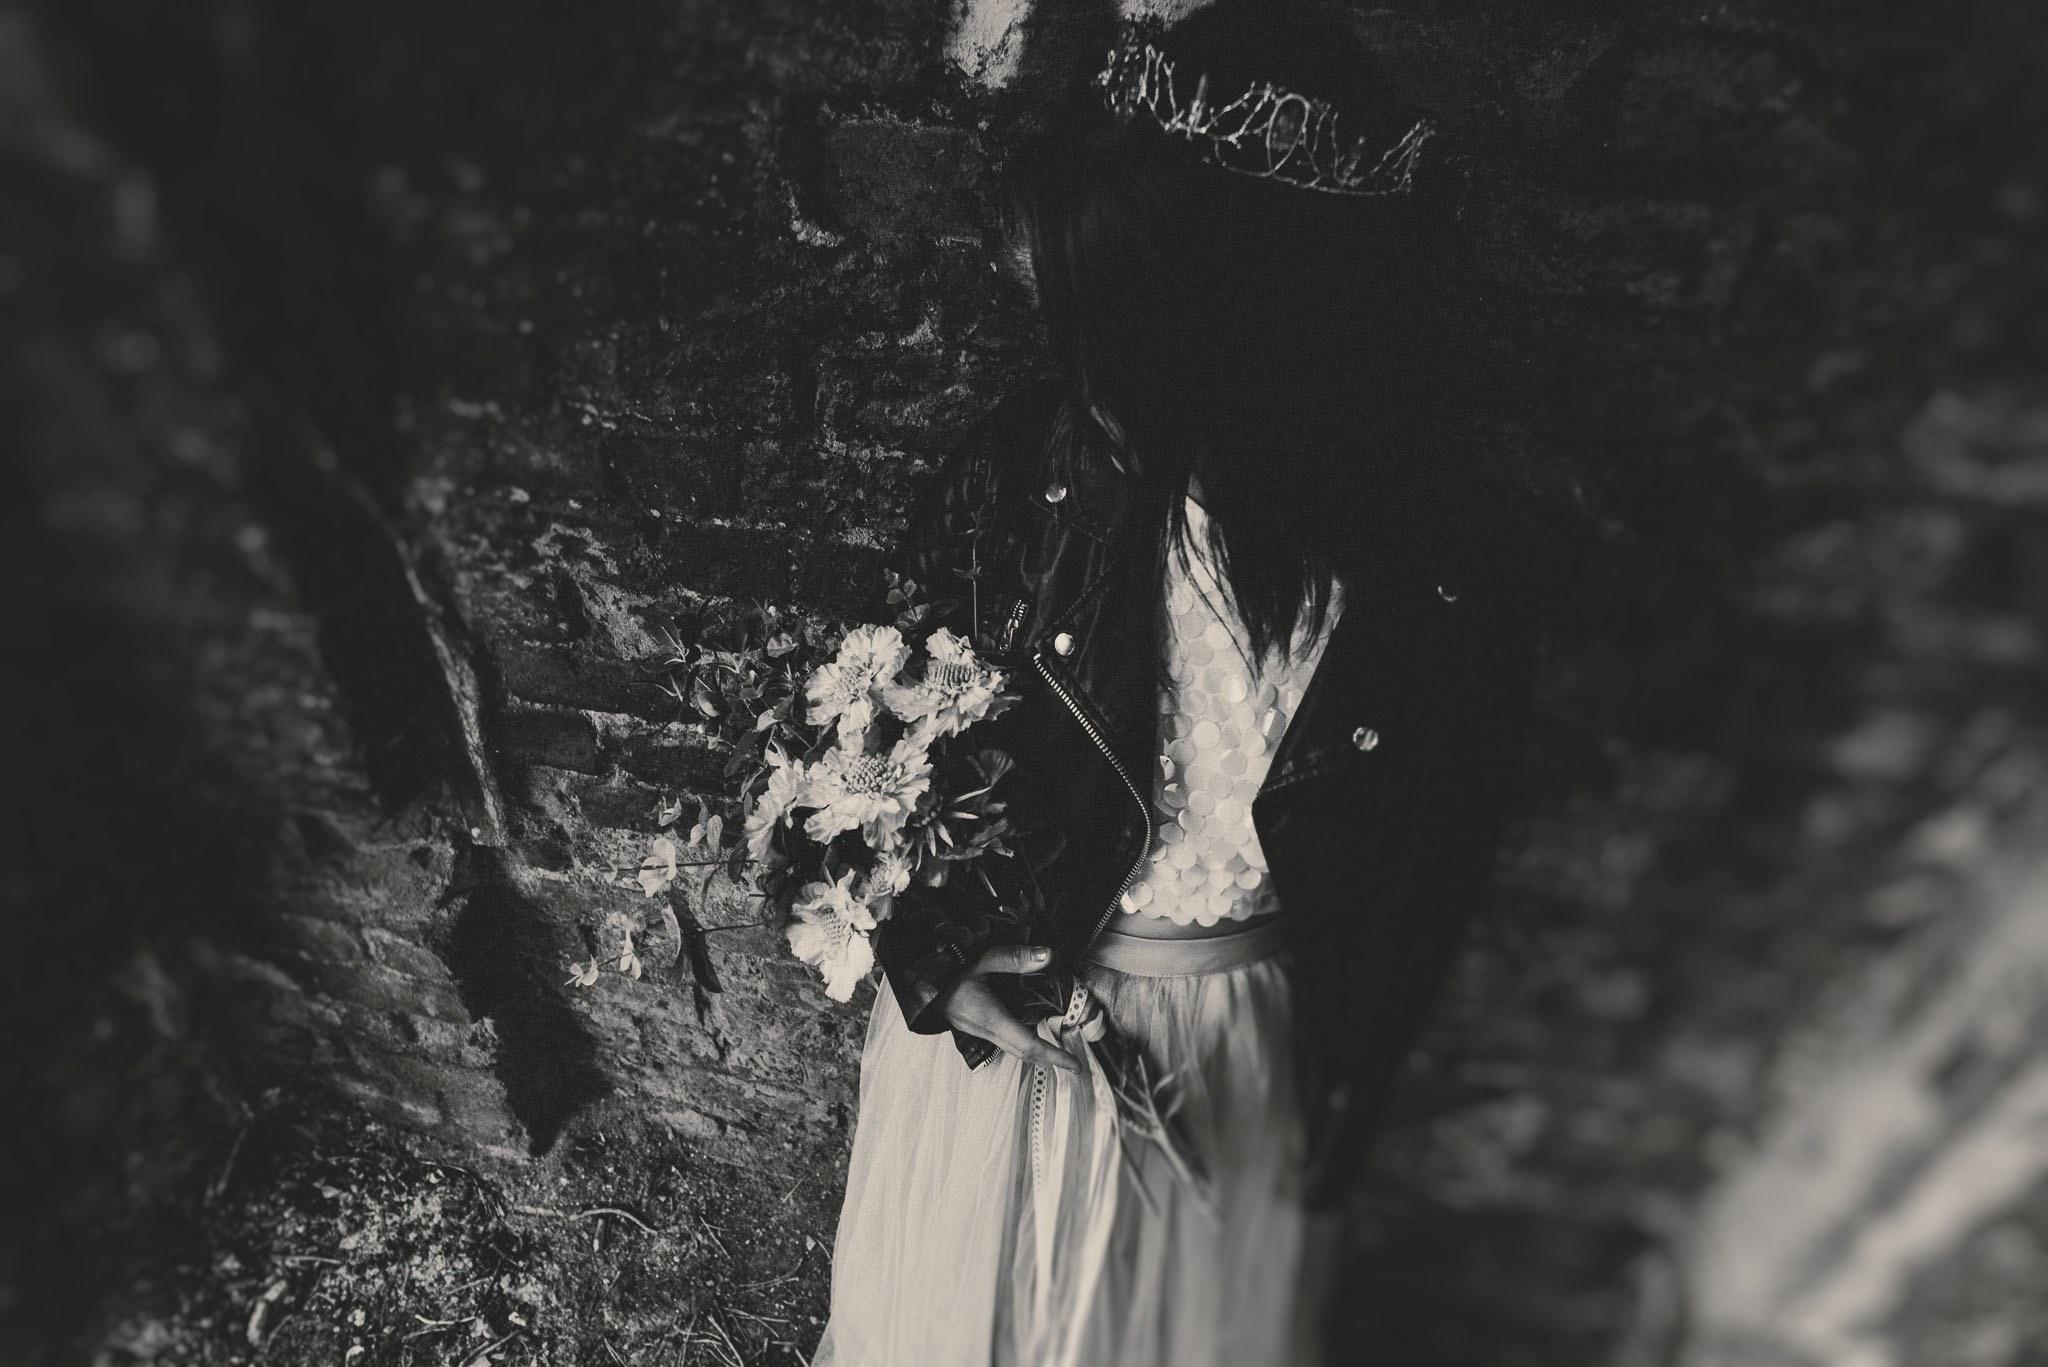 boho-free-spirited-bride-woodland-and-alternative-wedding-photography (3).jpg